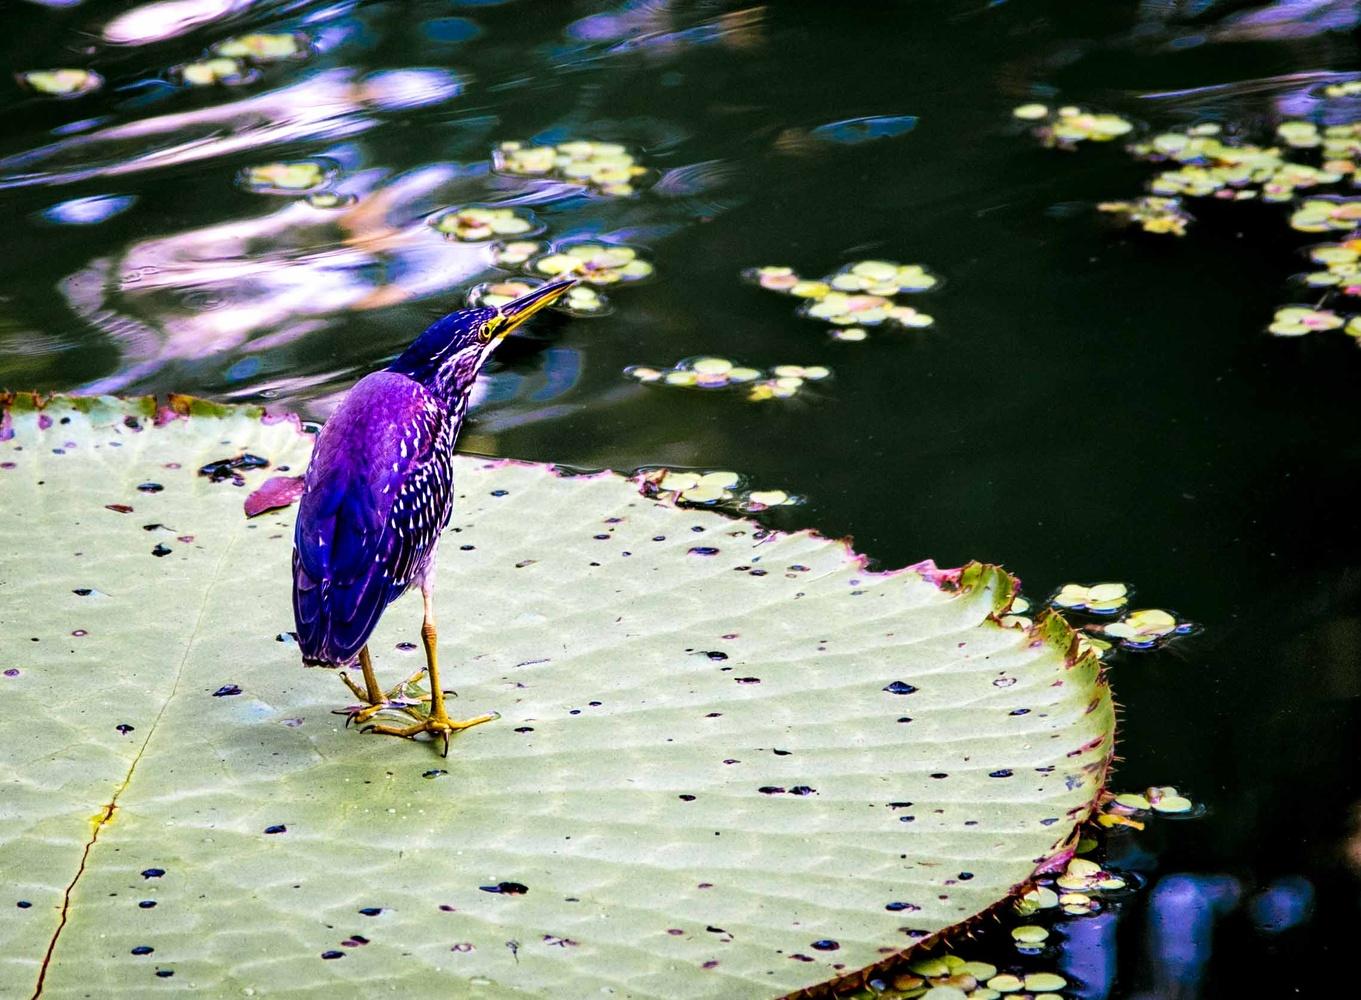 Bird on a Pad by Stuart Miles